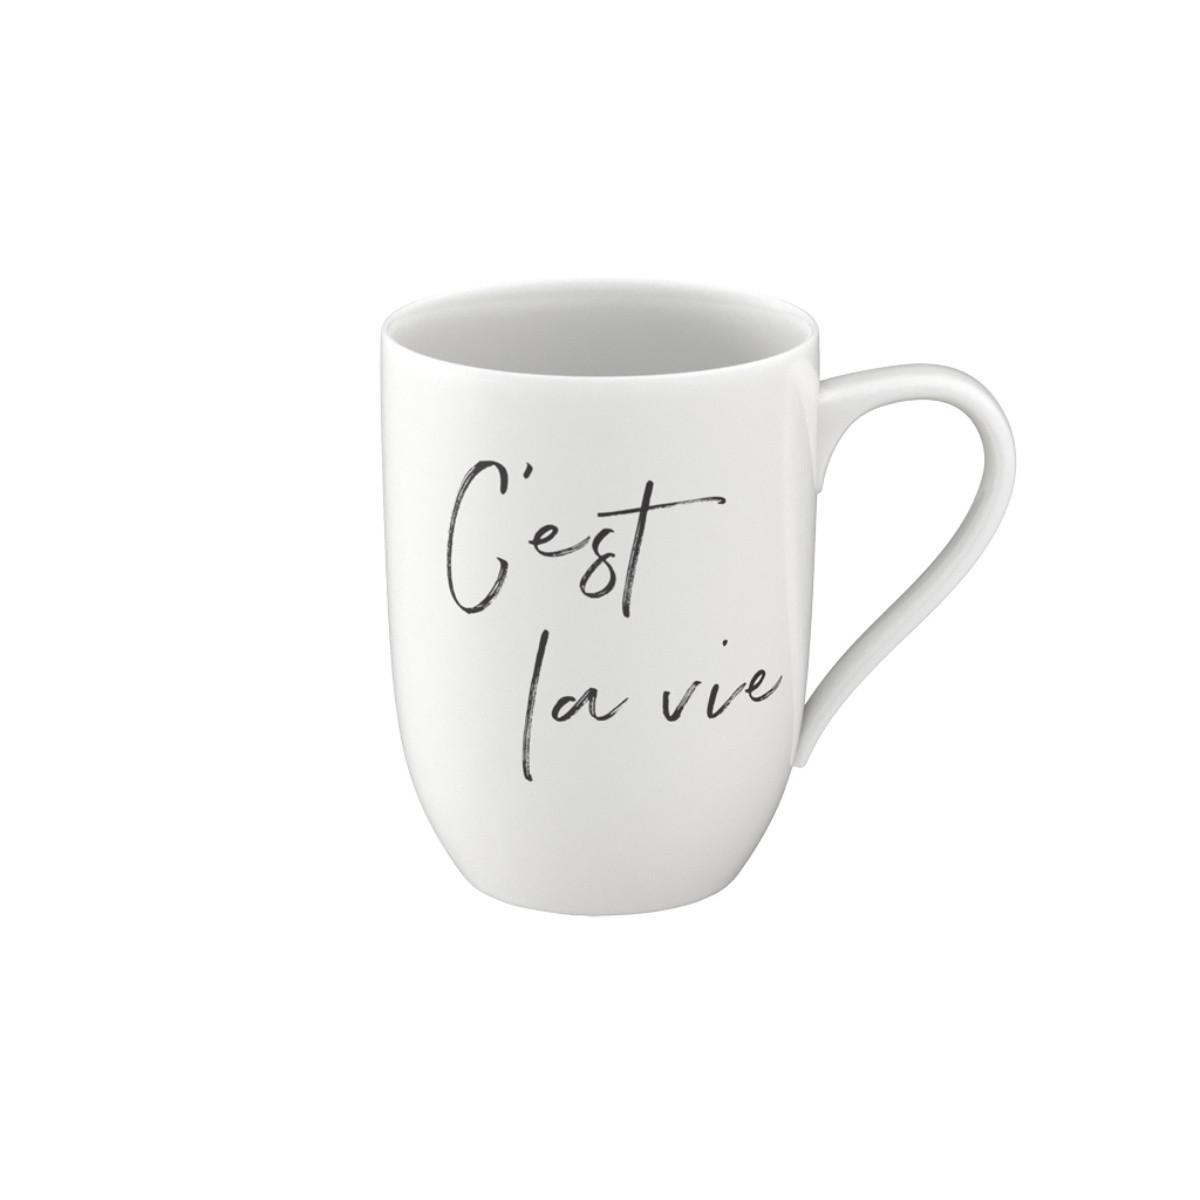 Statement Mug C est la vie